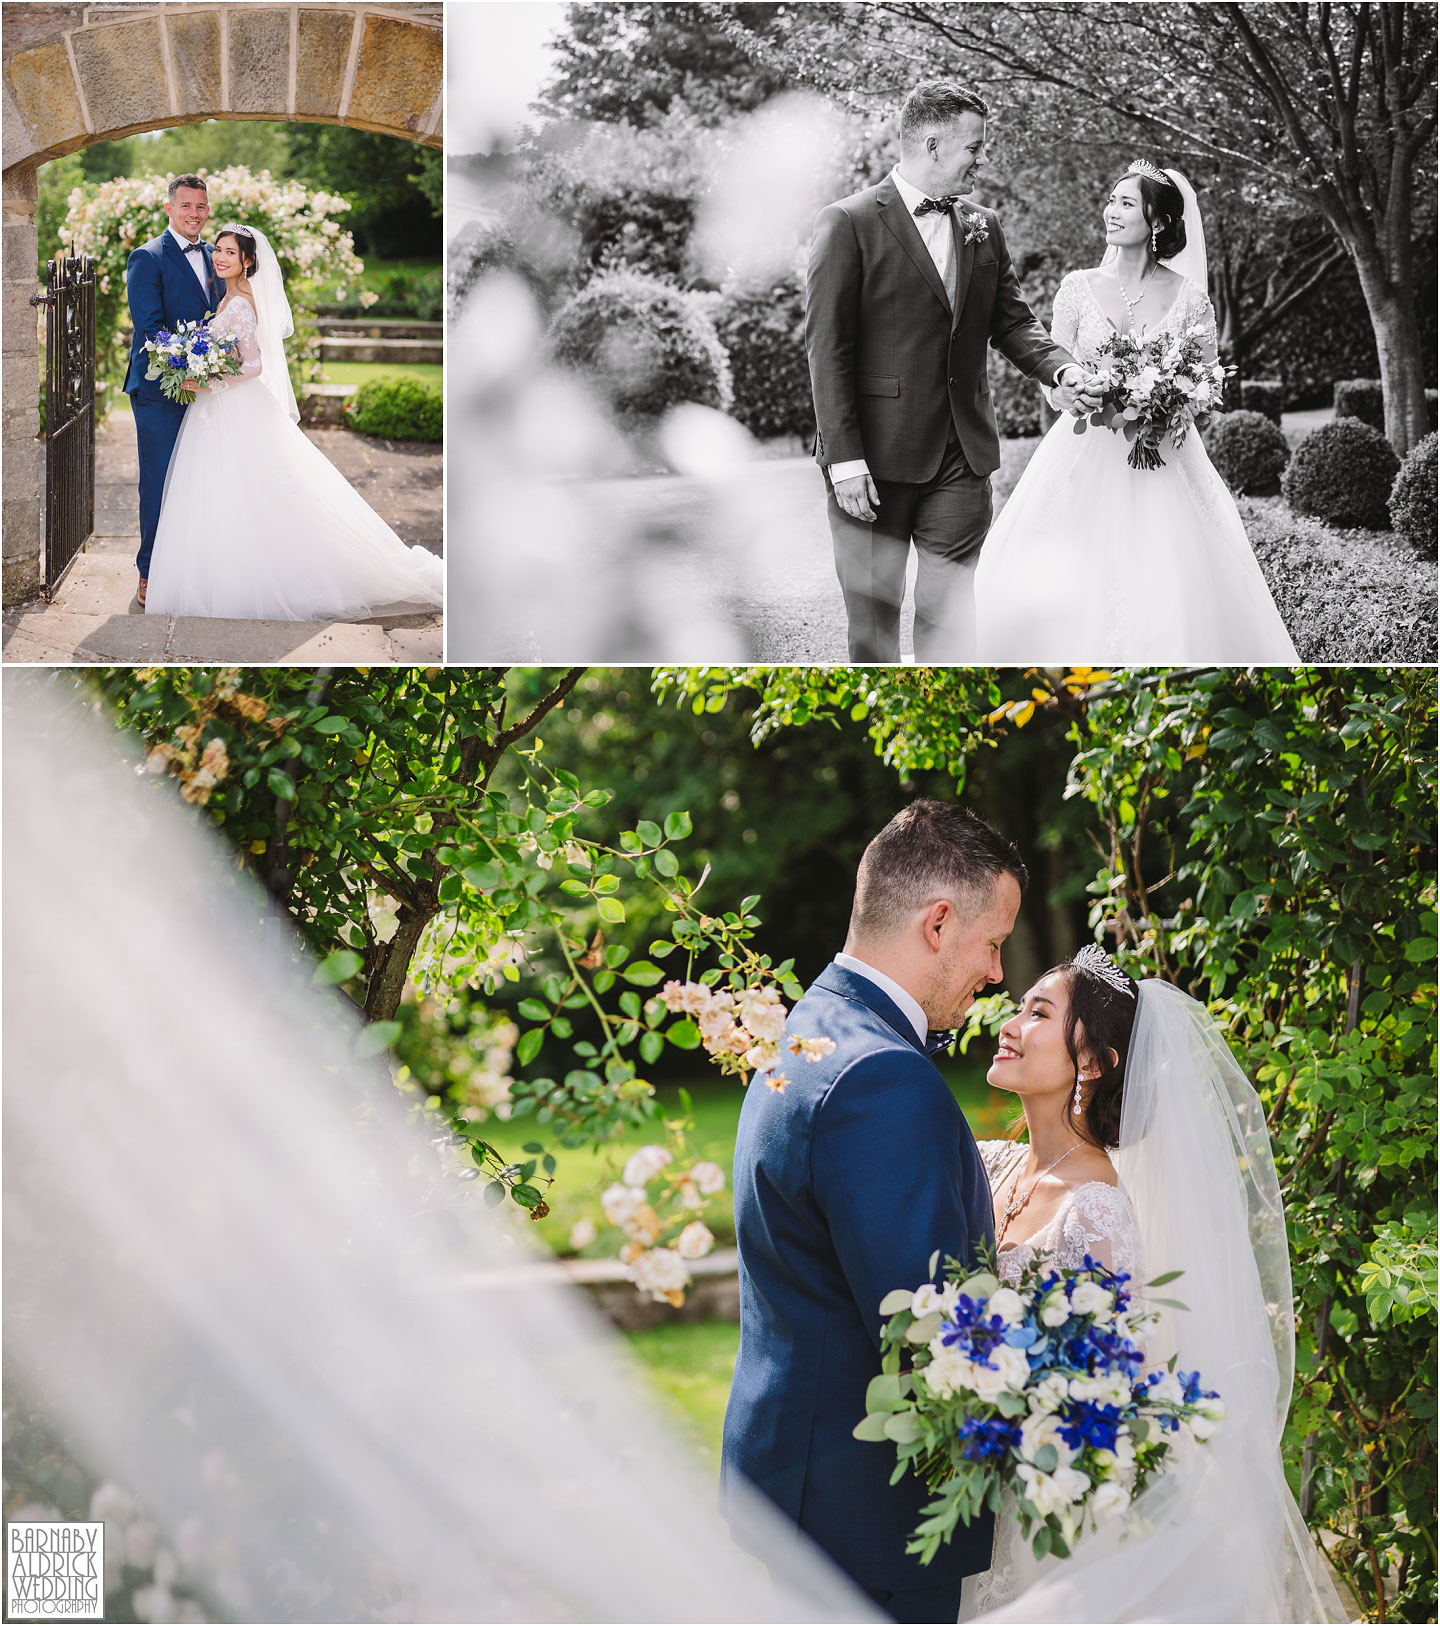 Wood Hall Hotel Wetherby wedding couple portraits, Wood Hall Wedding Photos, Wood Hall Wedding Photographer